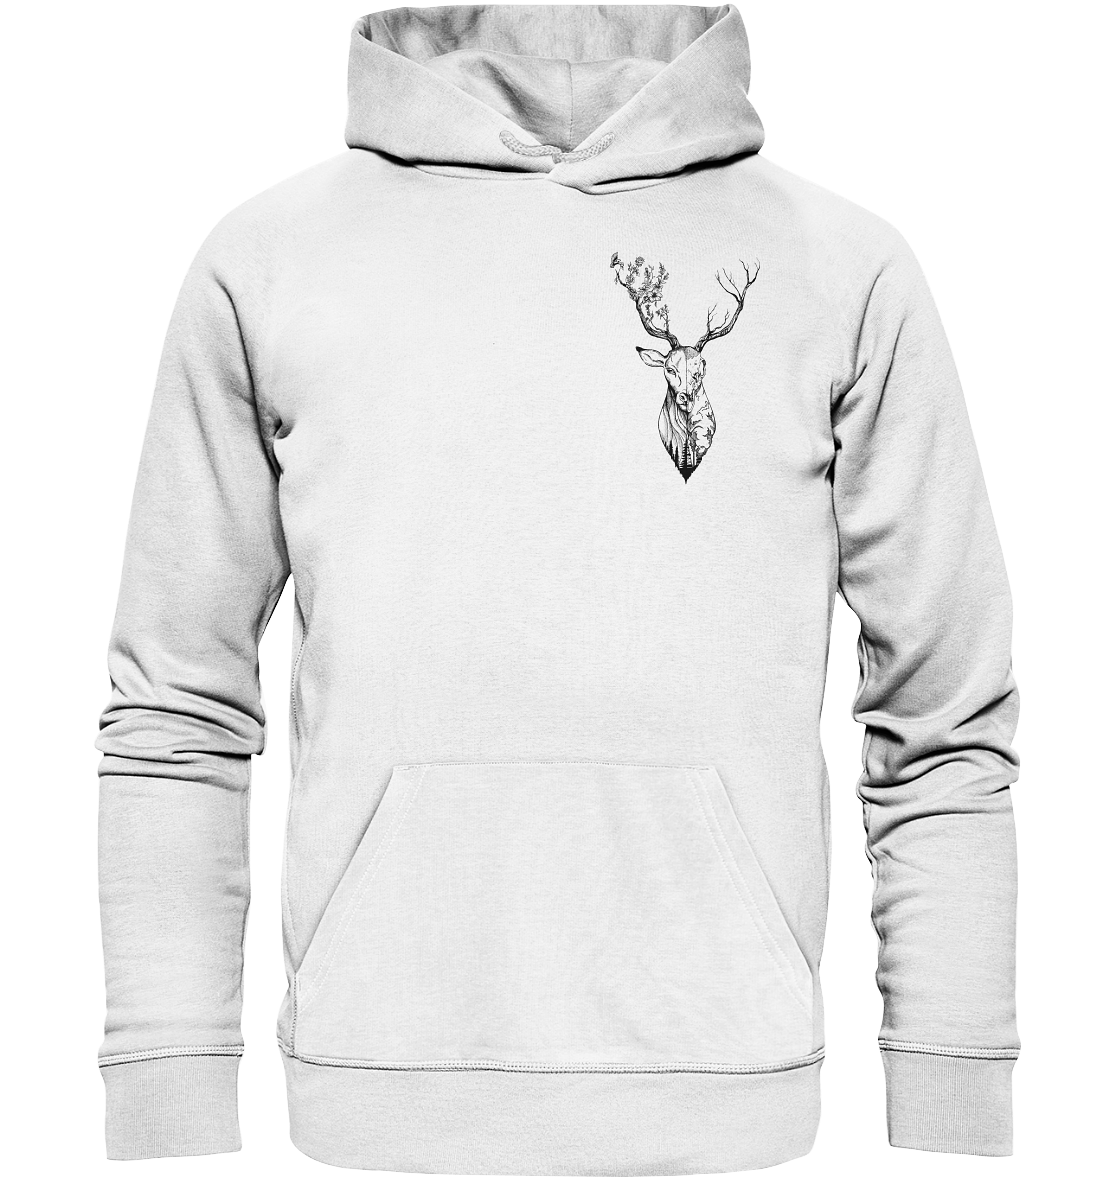 front-organic-hoodie-f8f8f8-1116x-7.png